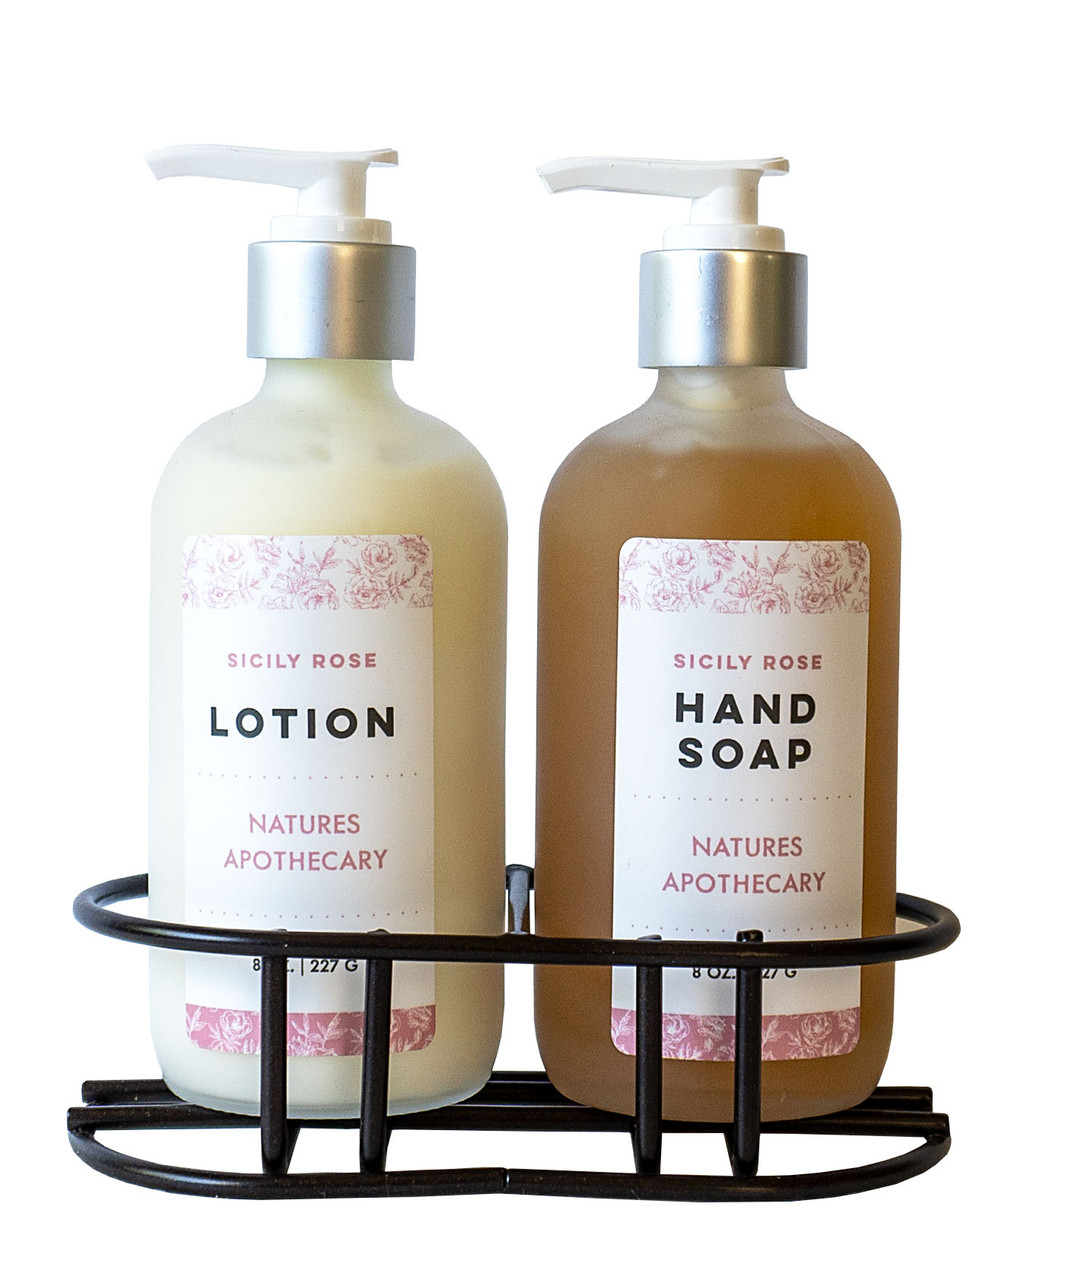 Sicily Rose Liquid Soap - Nature's Apothecary DAYSPA Body Basics